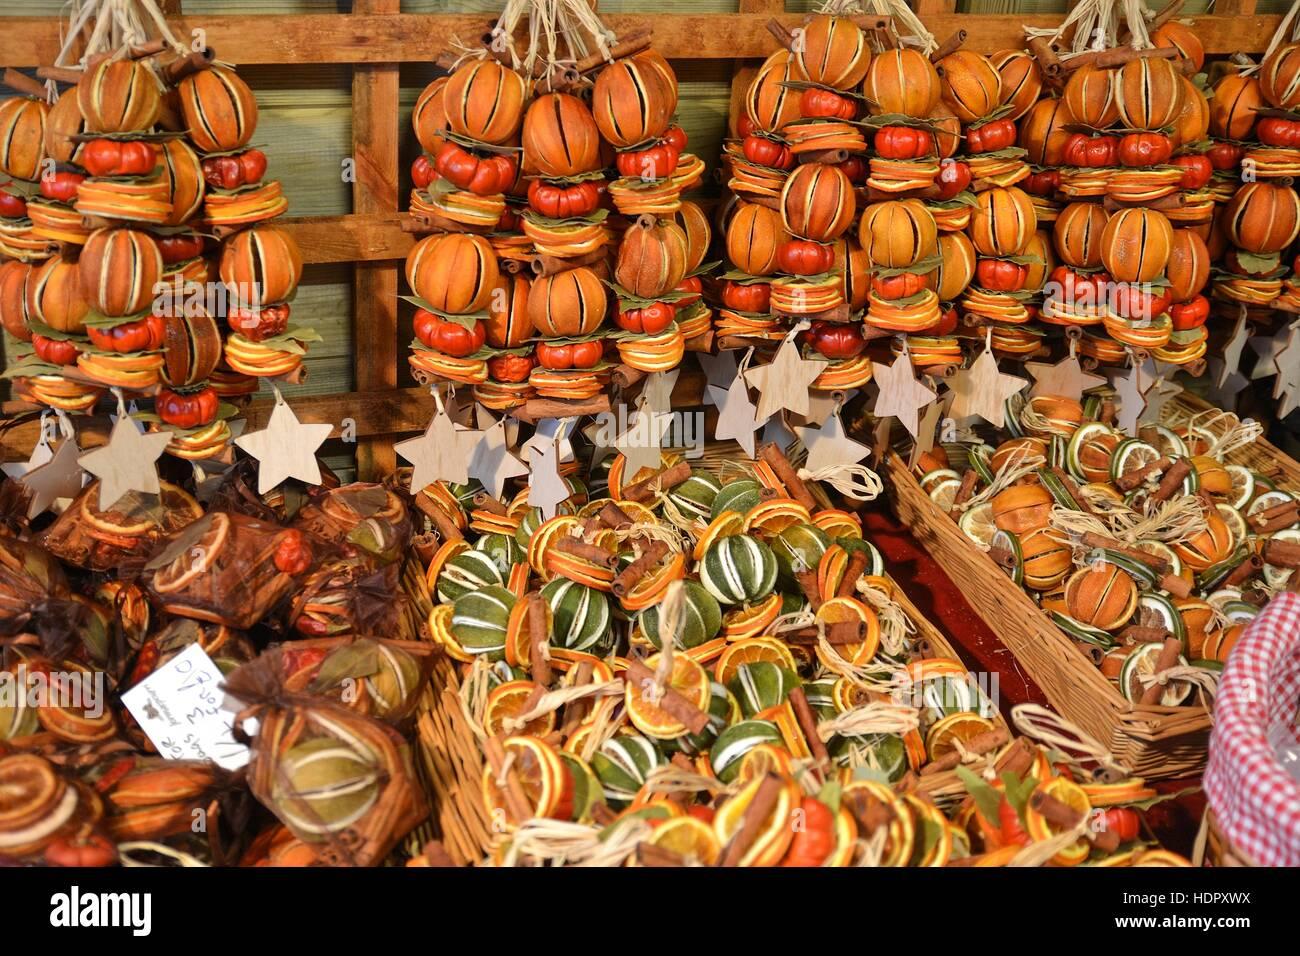 Dried Orange Christmas Garlands At Waddesdon Manor Christmas Market